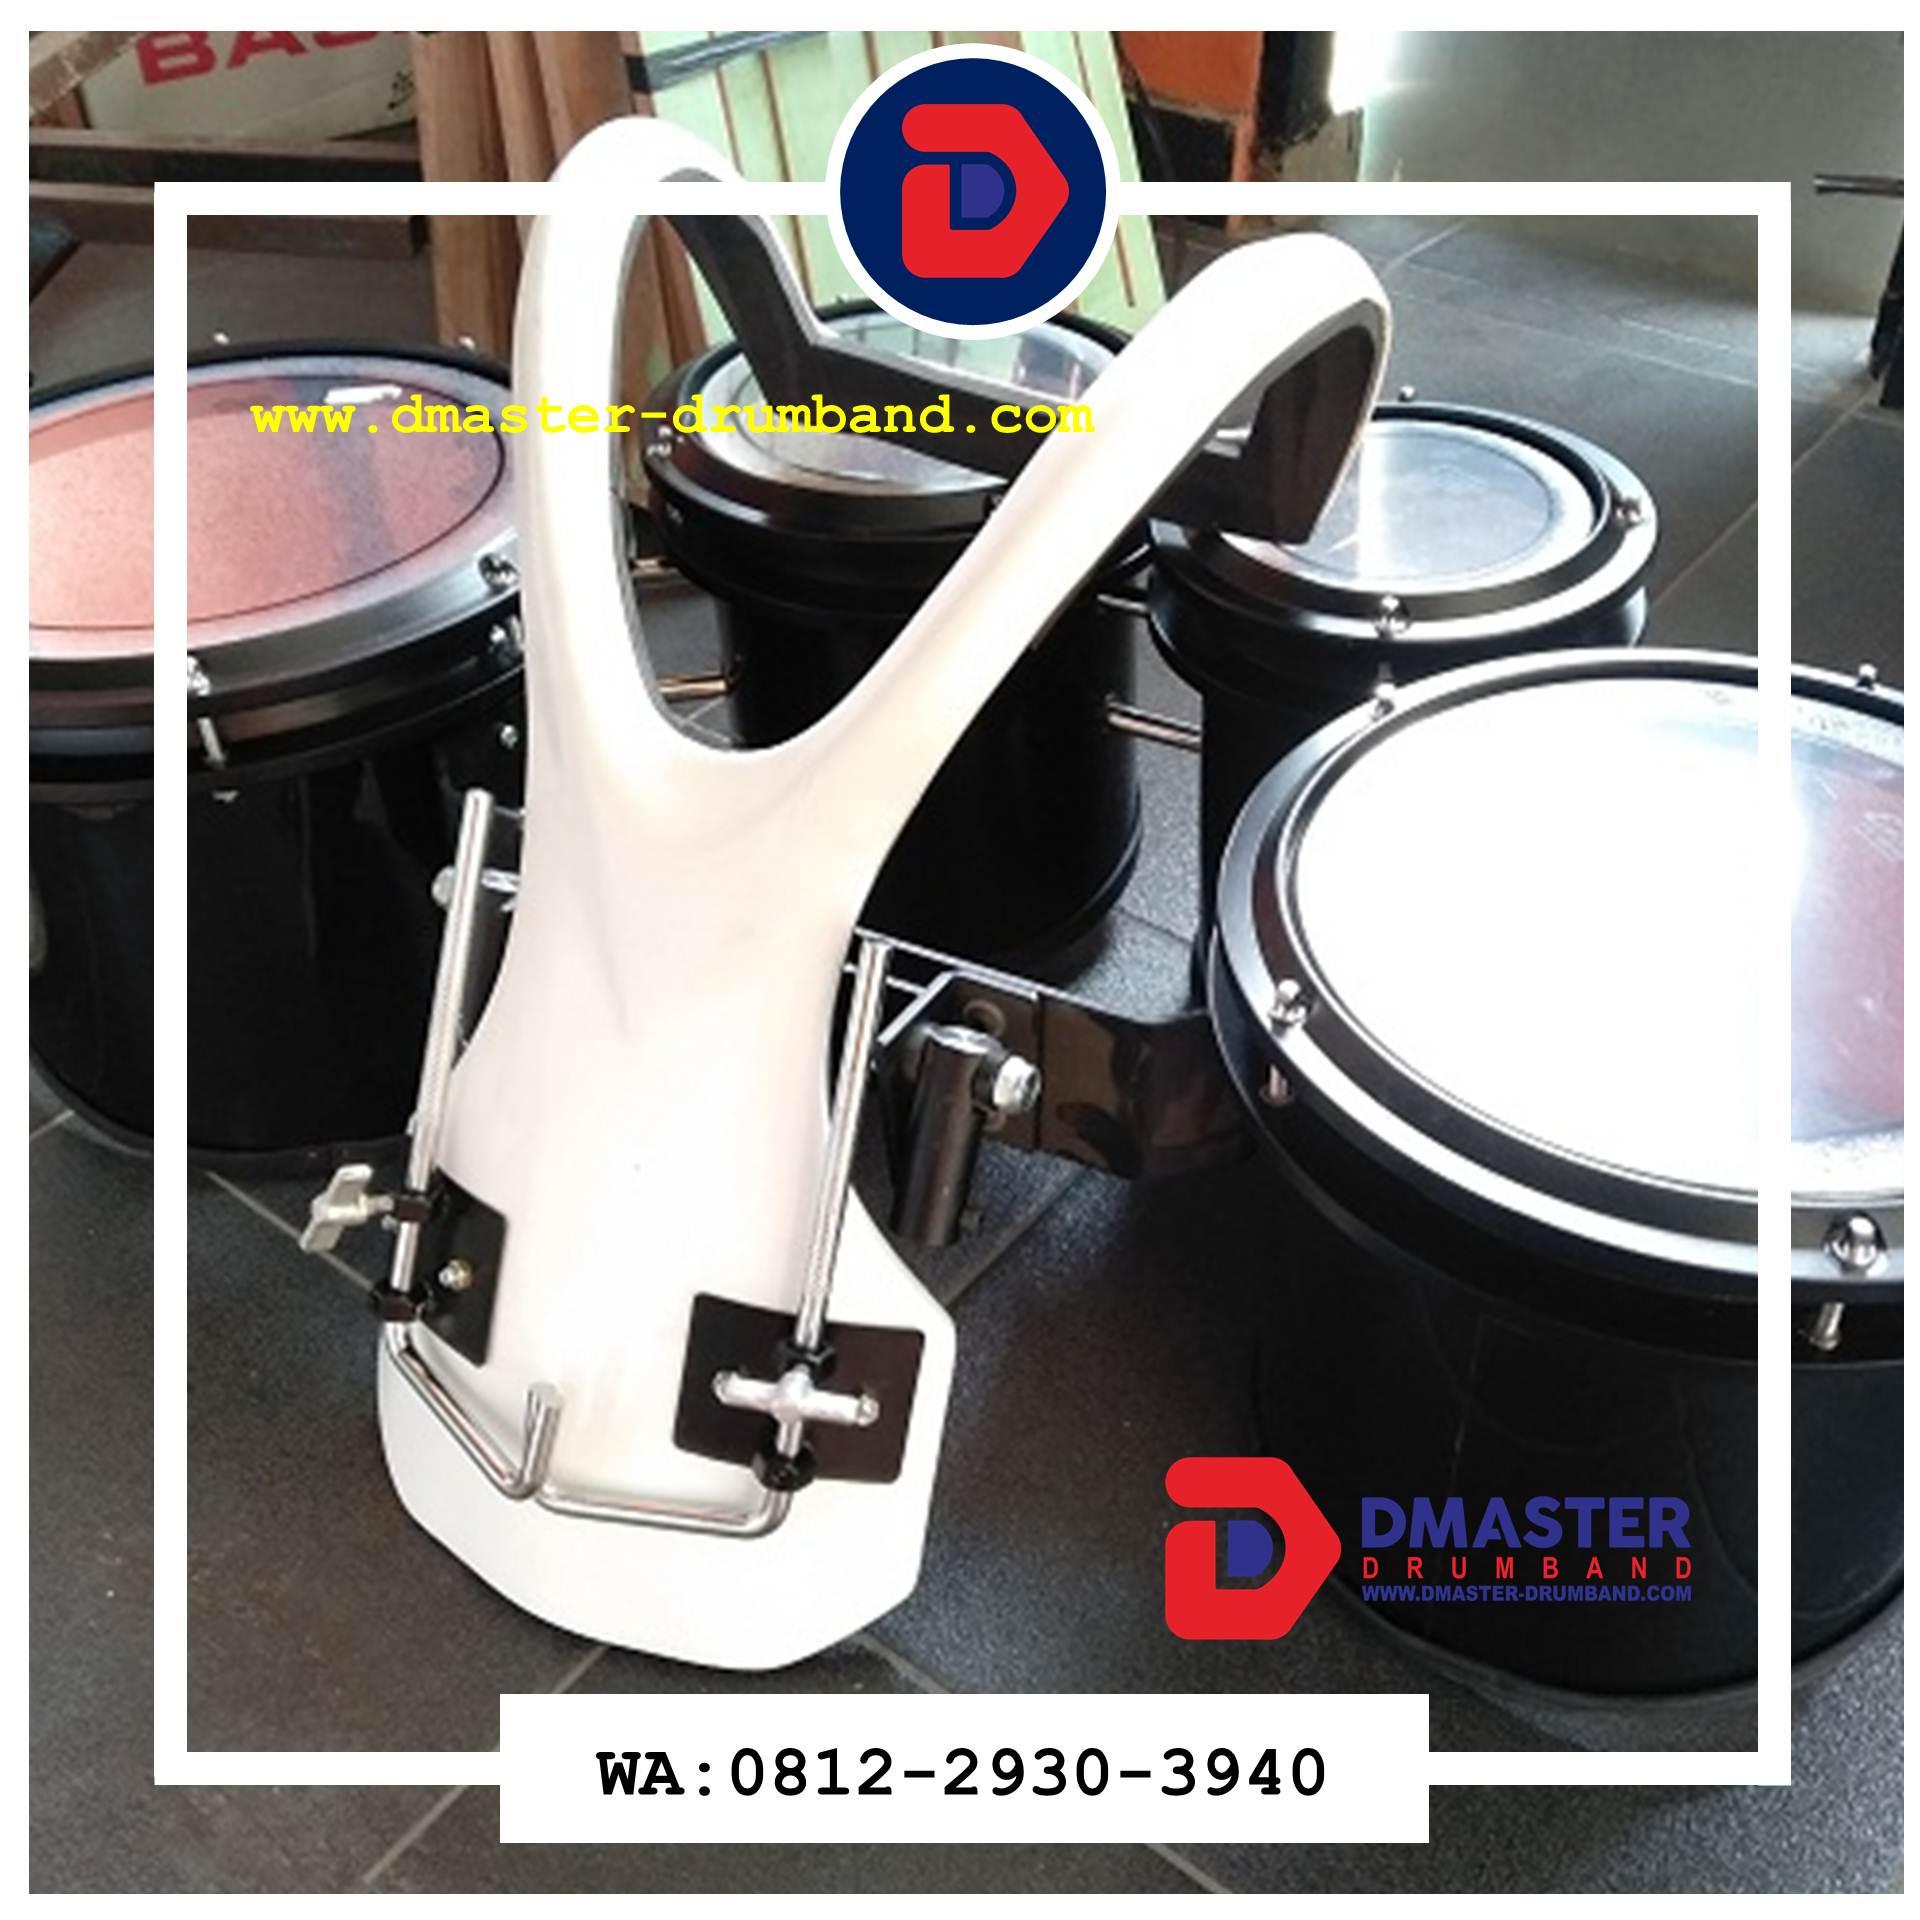 jual drumband HTS | marching band | dmaster-drumband | wa.0812-2930-3940